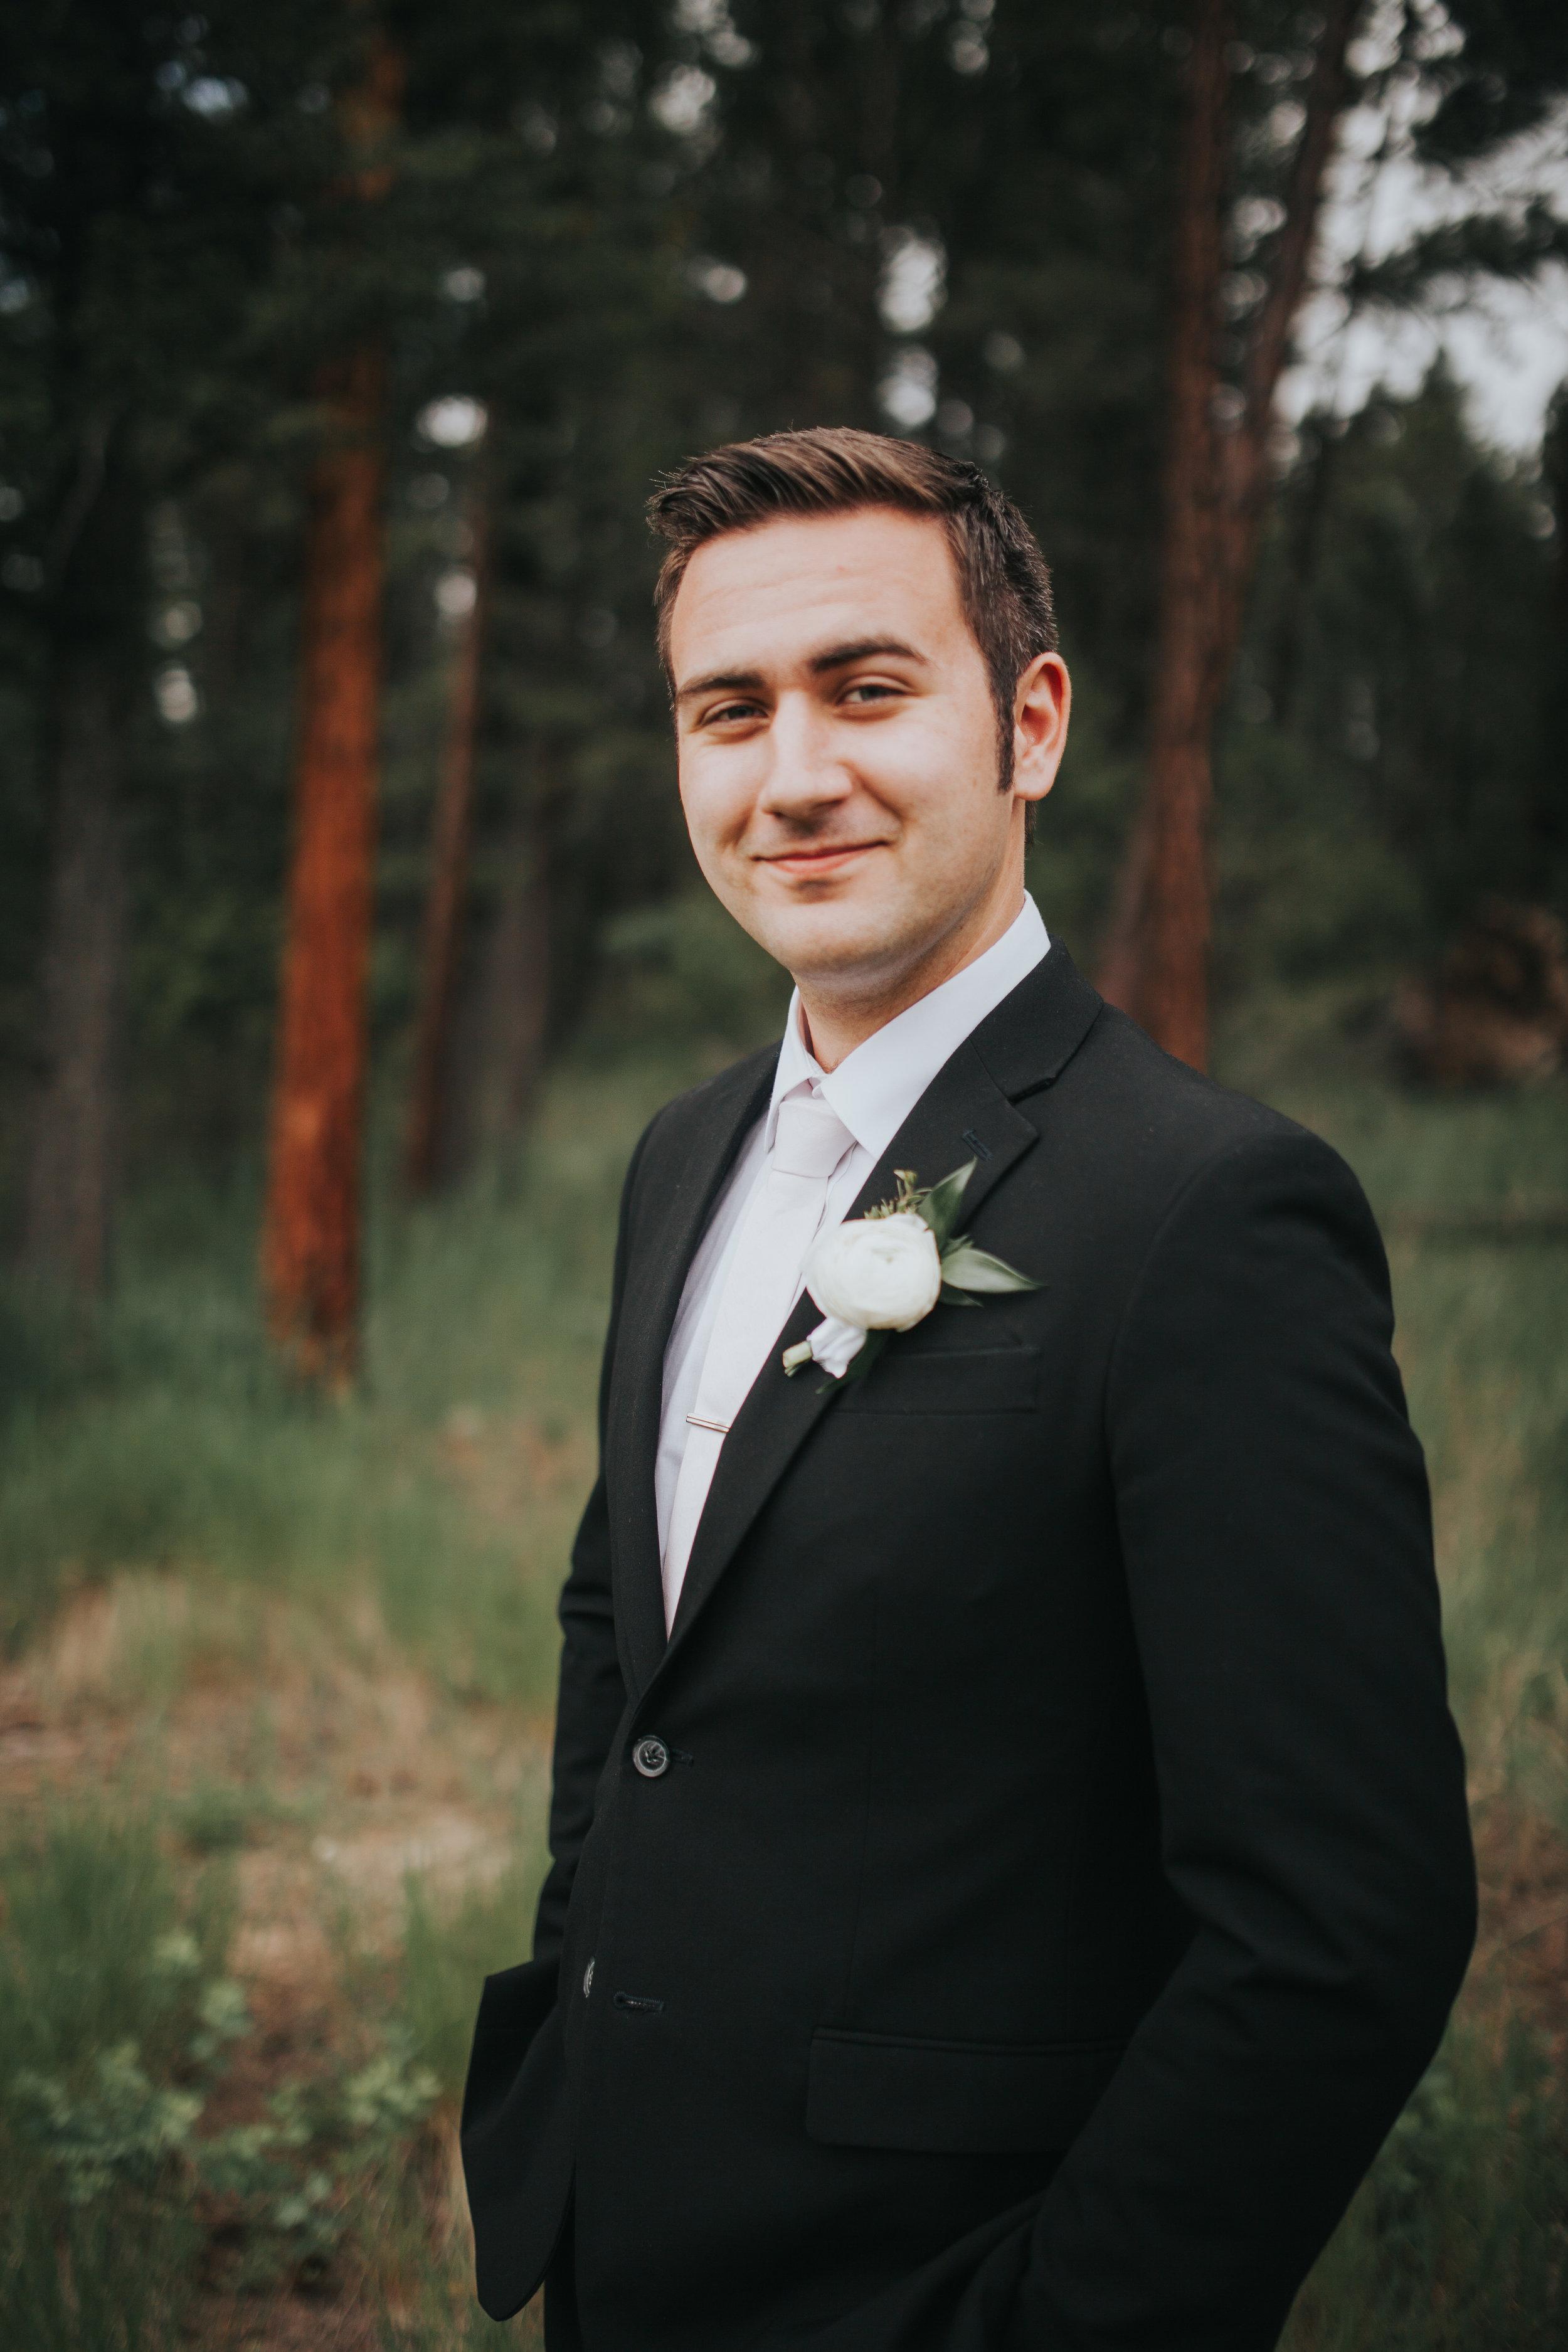 Ryter 4 - Bridal Portraits-46.jpg